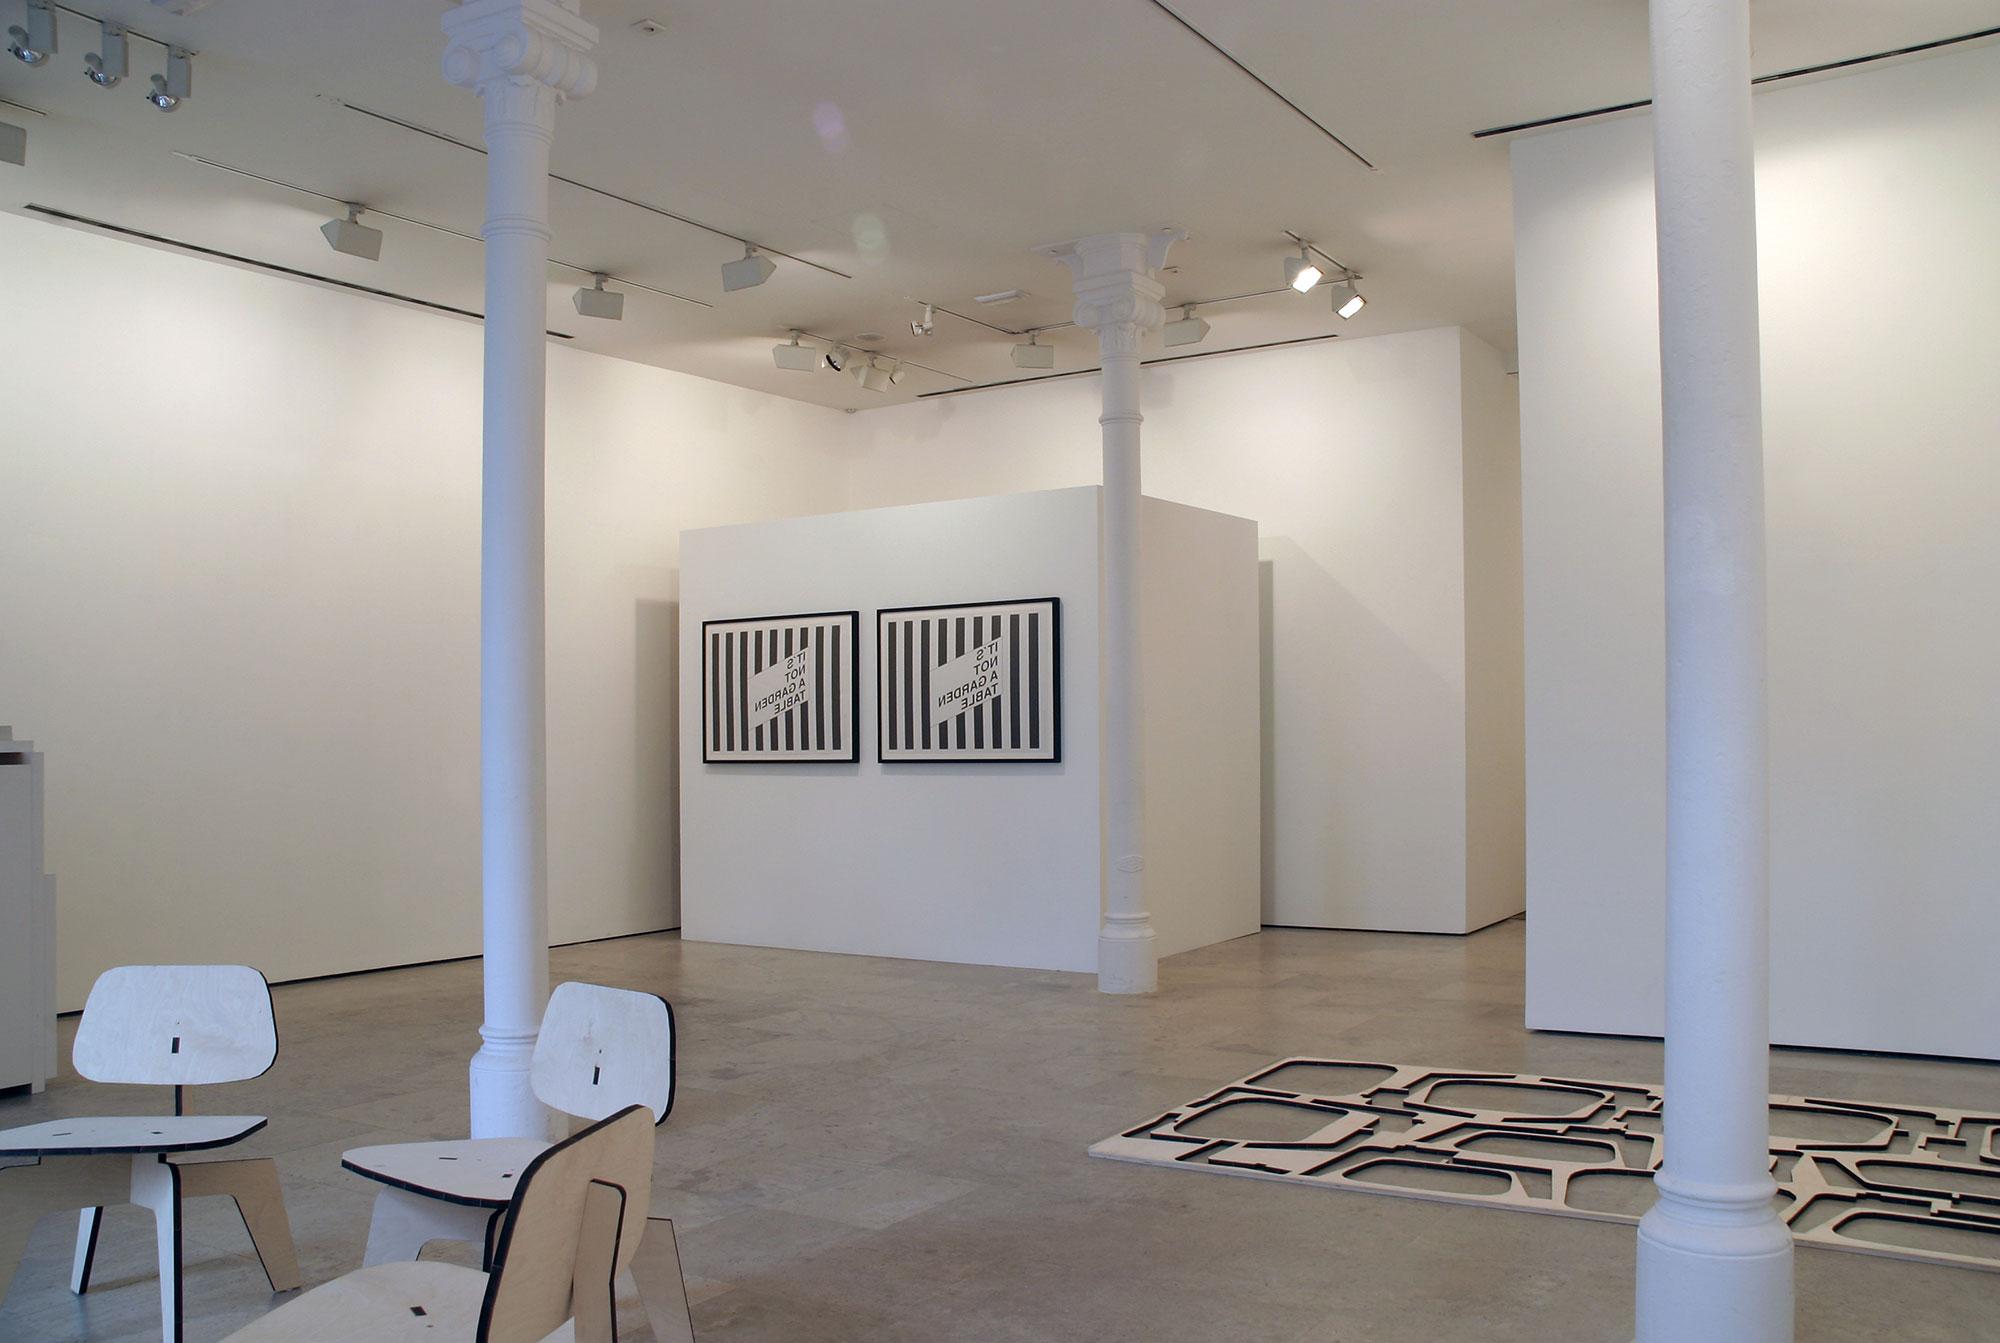 Xabier Salaberria (2007) - Untitled